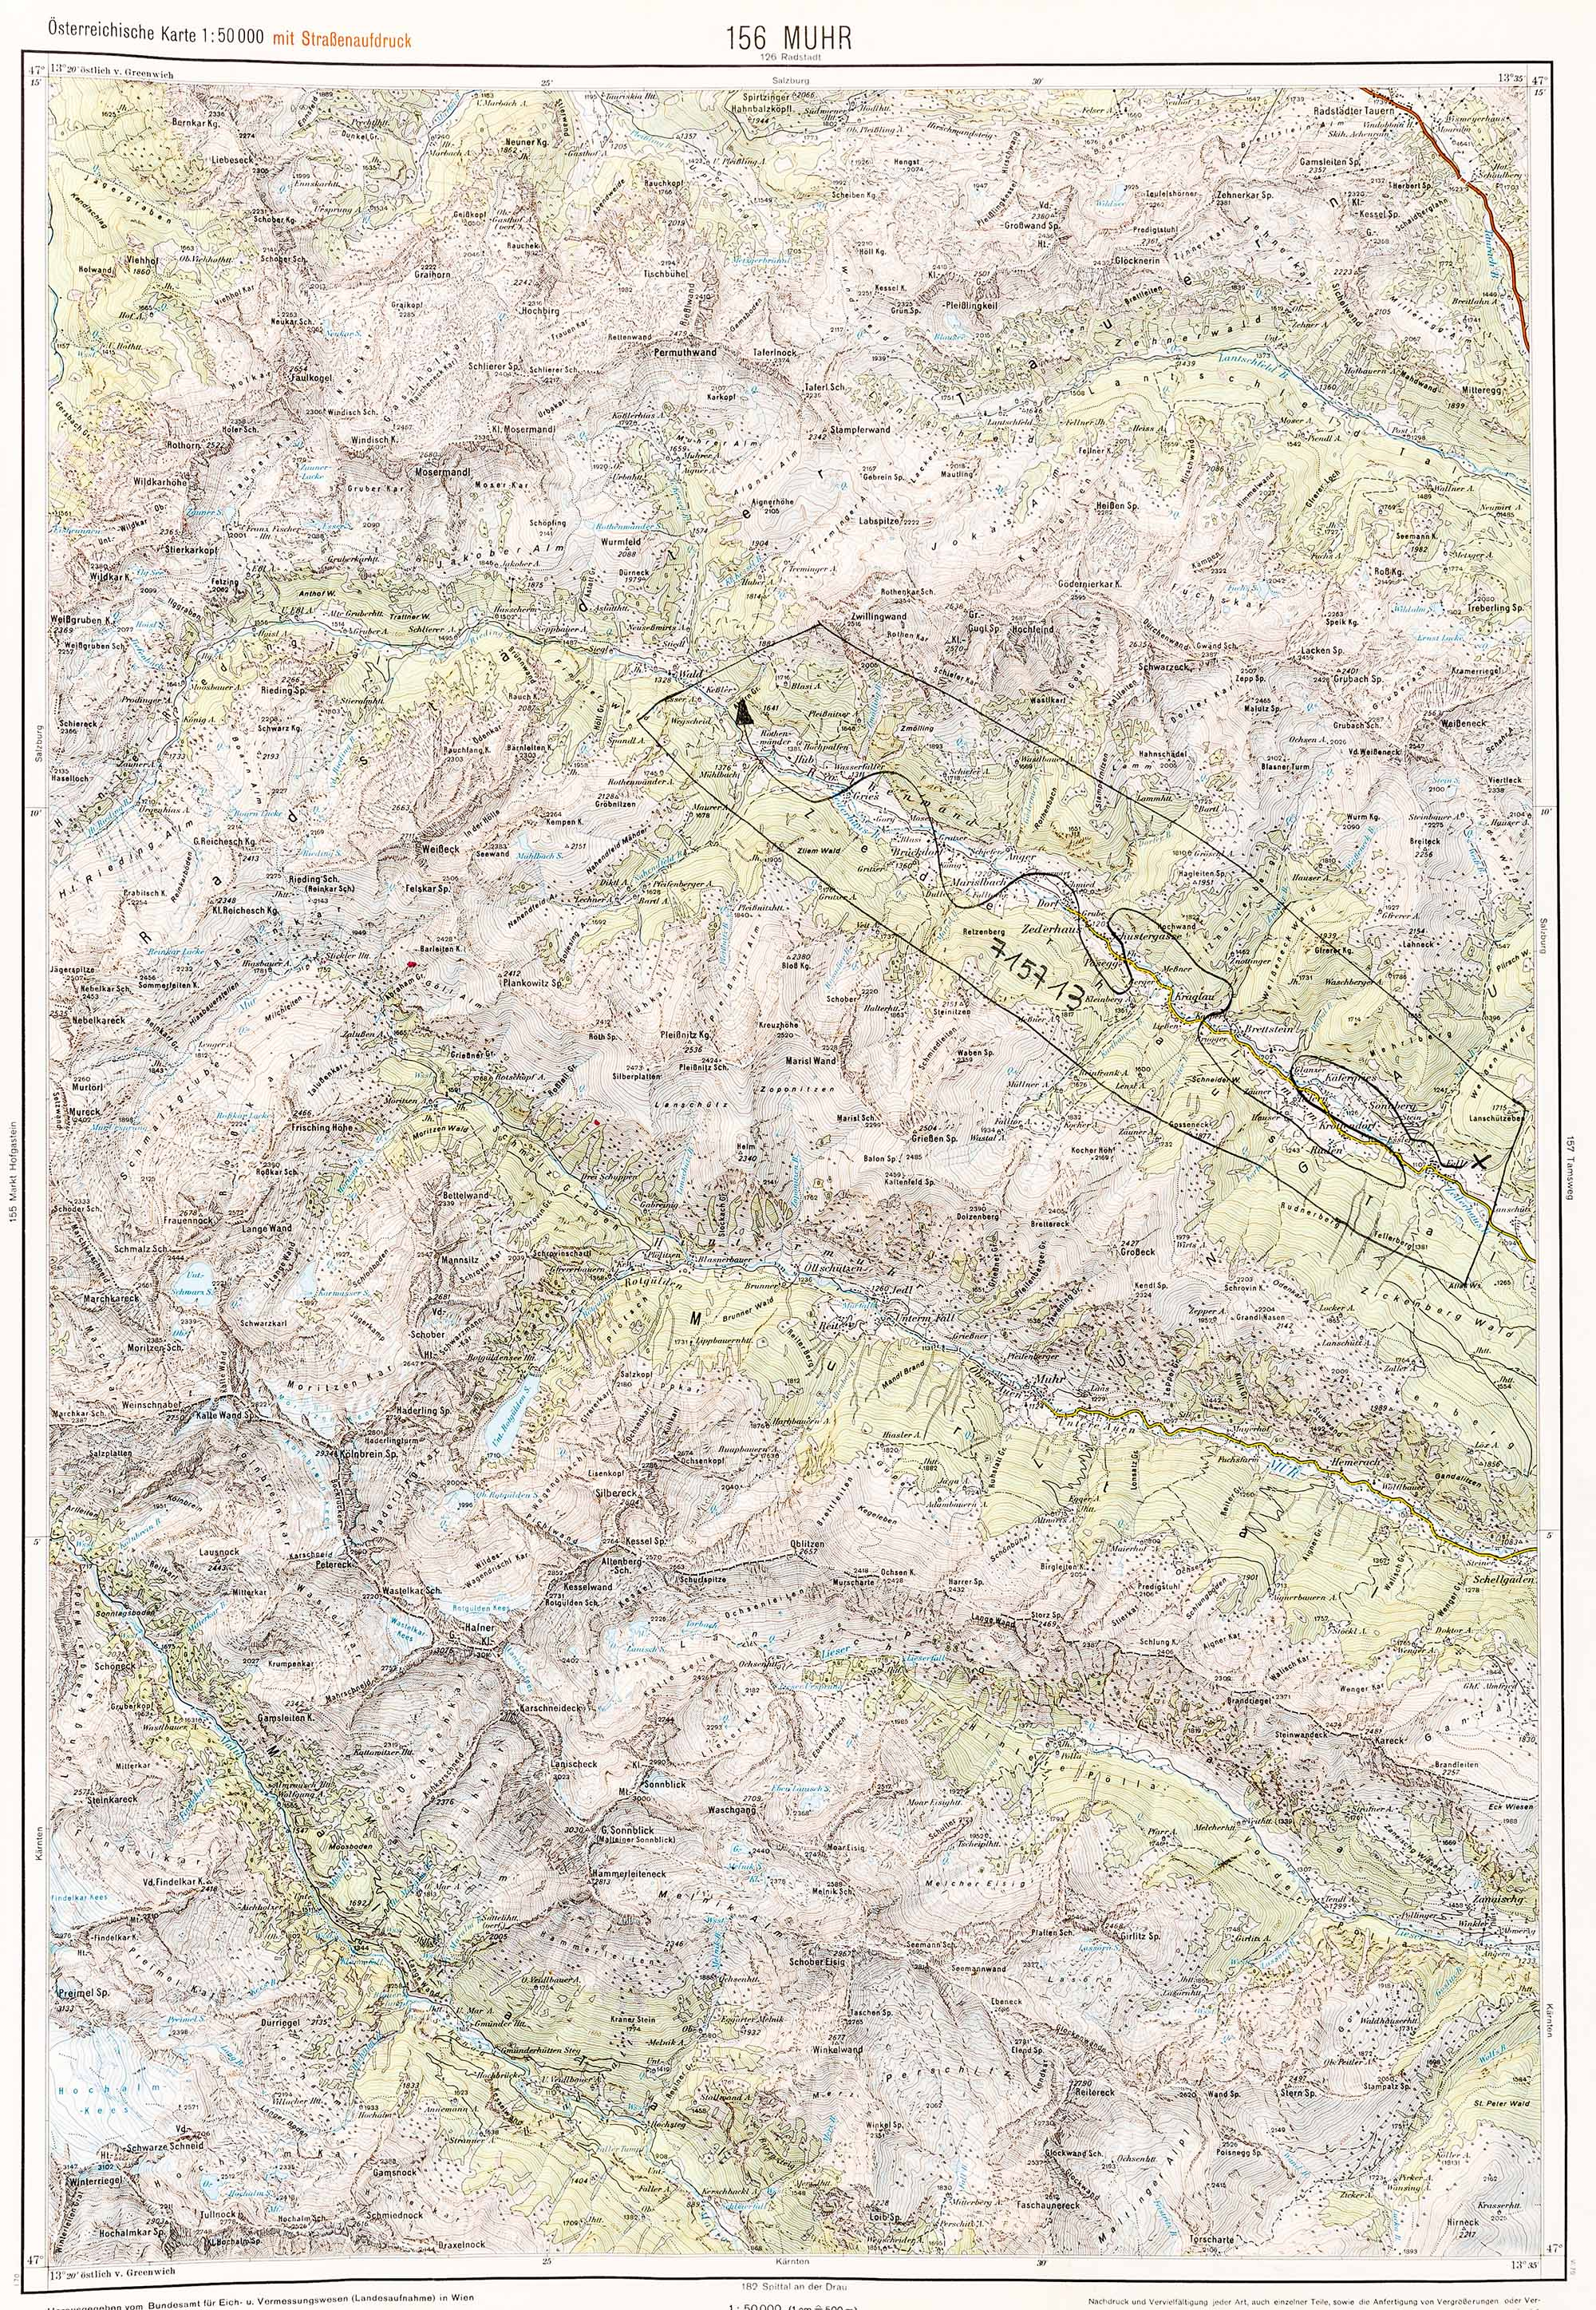 1975-1979 Karte 156